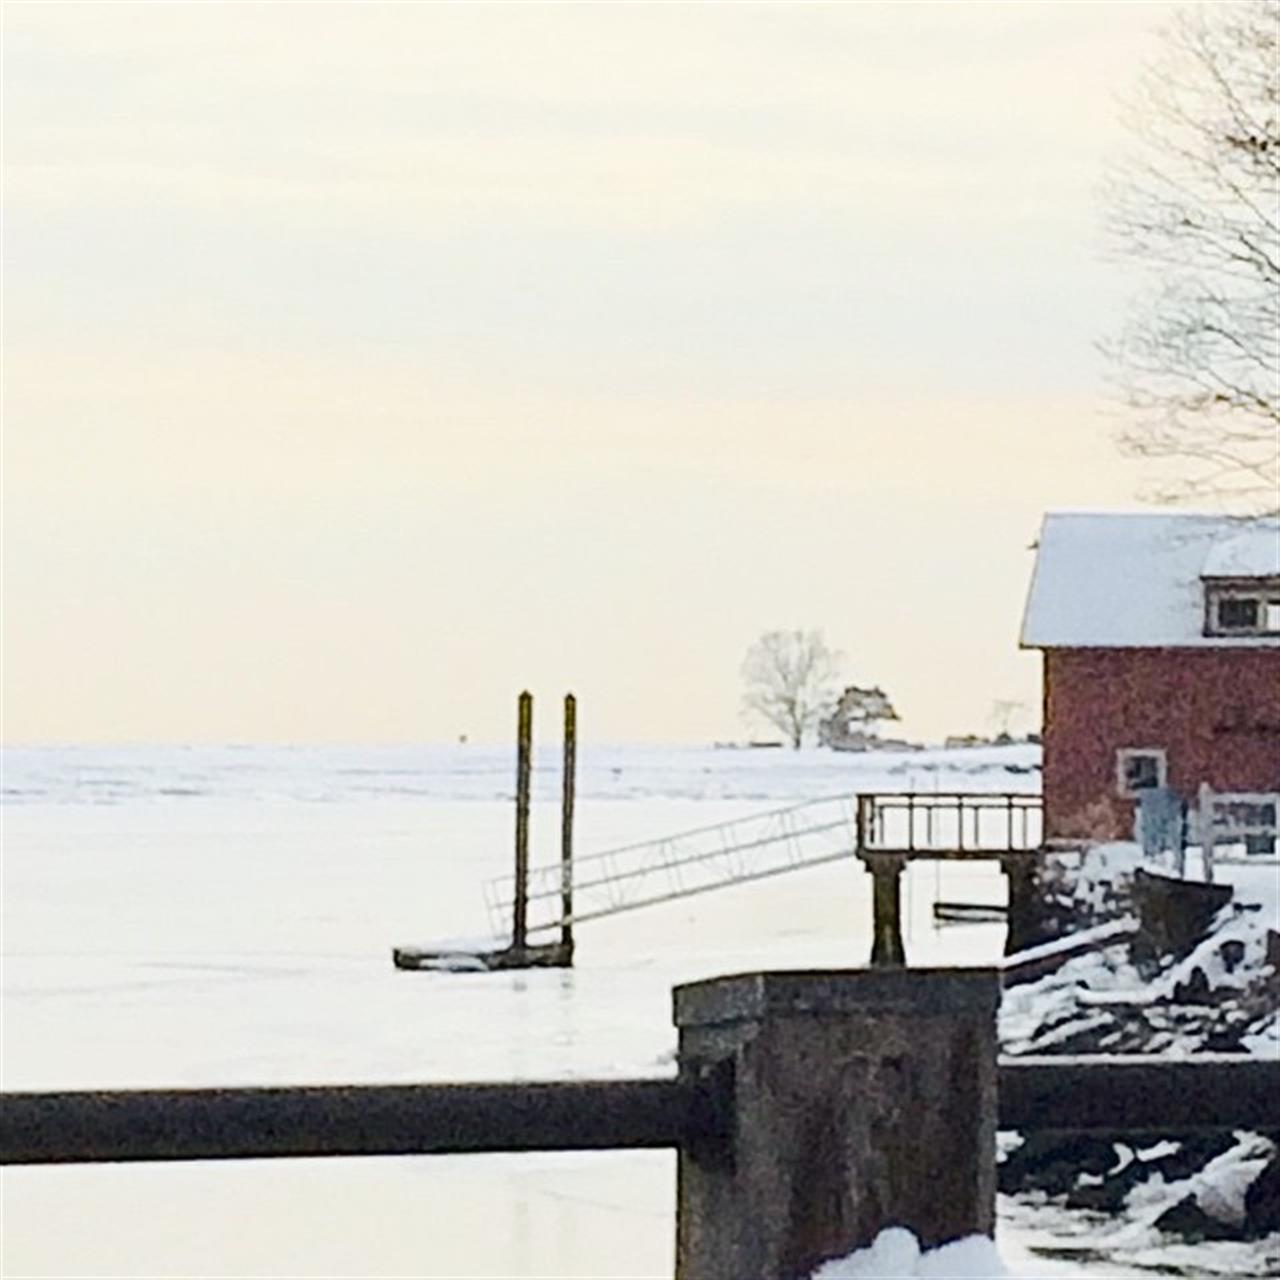 My favorite bridge in ice and snow. #ilovefairfieldct #sascocreek #sea #ski #coastalconnecticut #LeadingRELocal